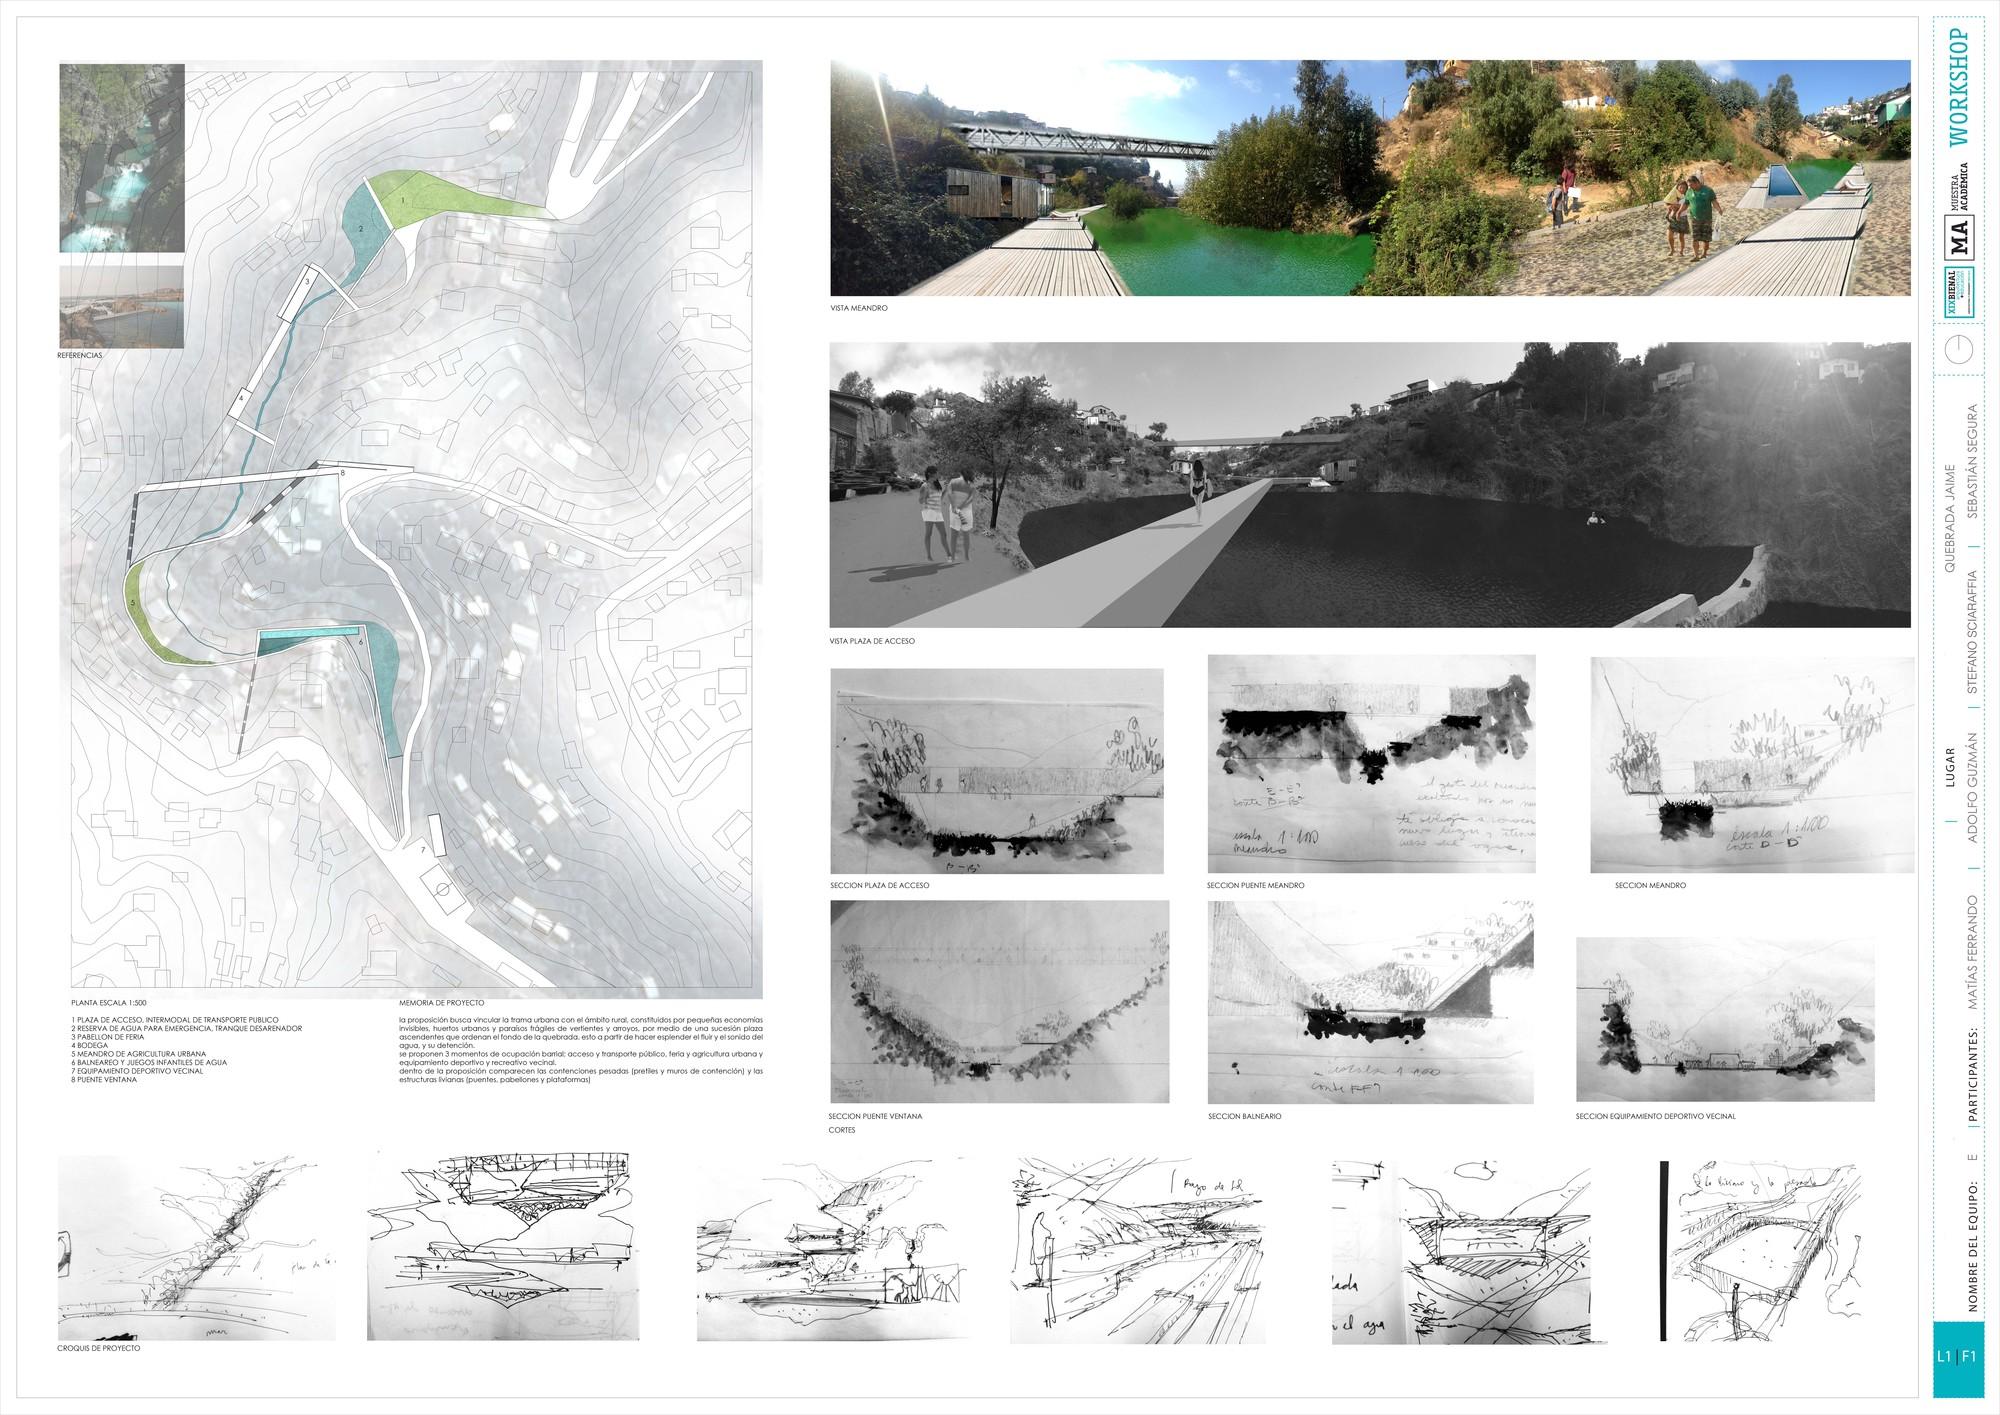 Primer Lugar: Lámina #02. Image Cortesia de Equipo XIX Bienal